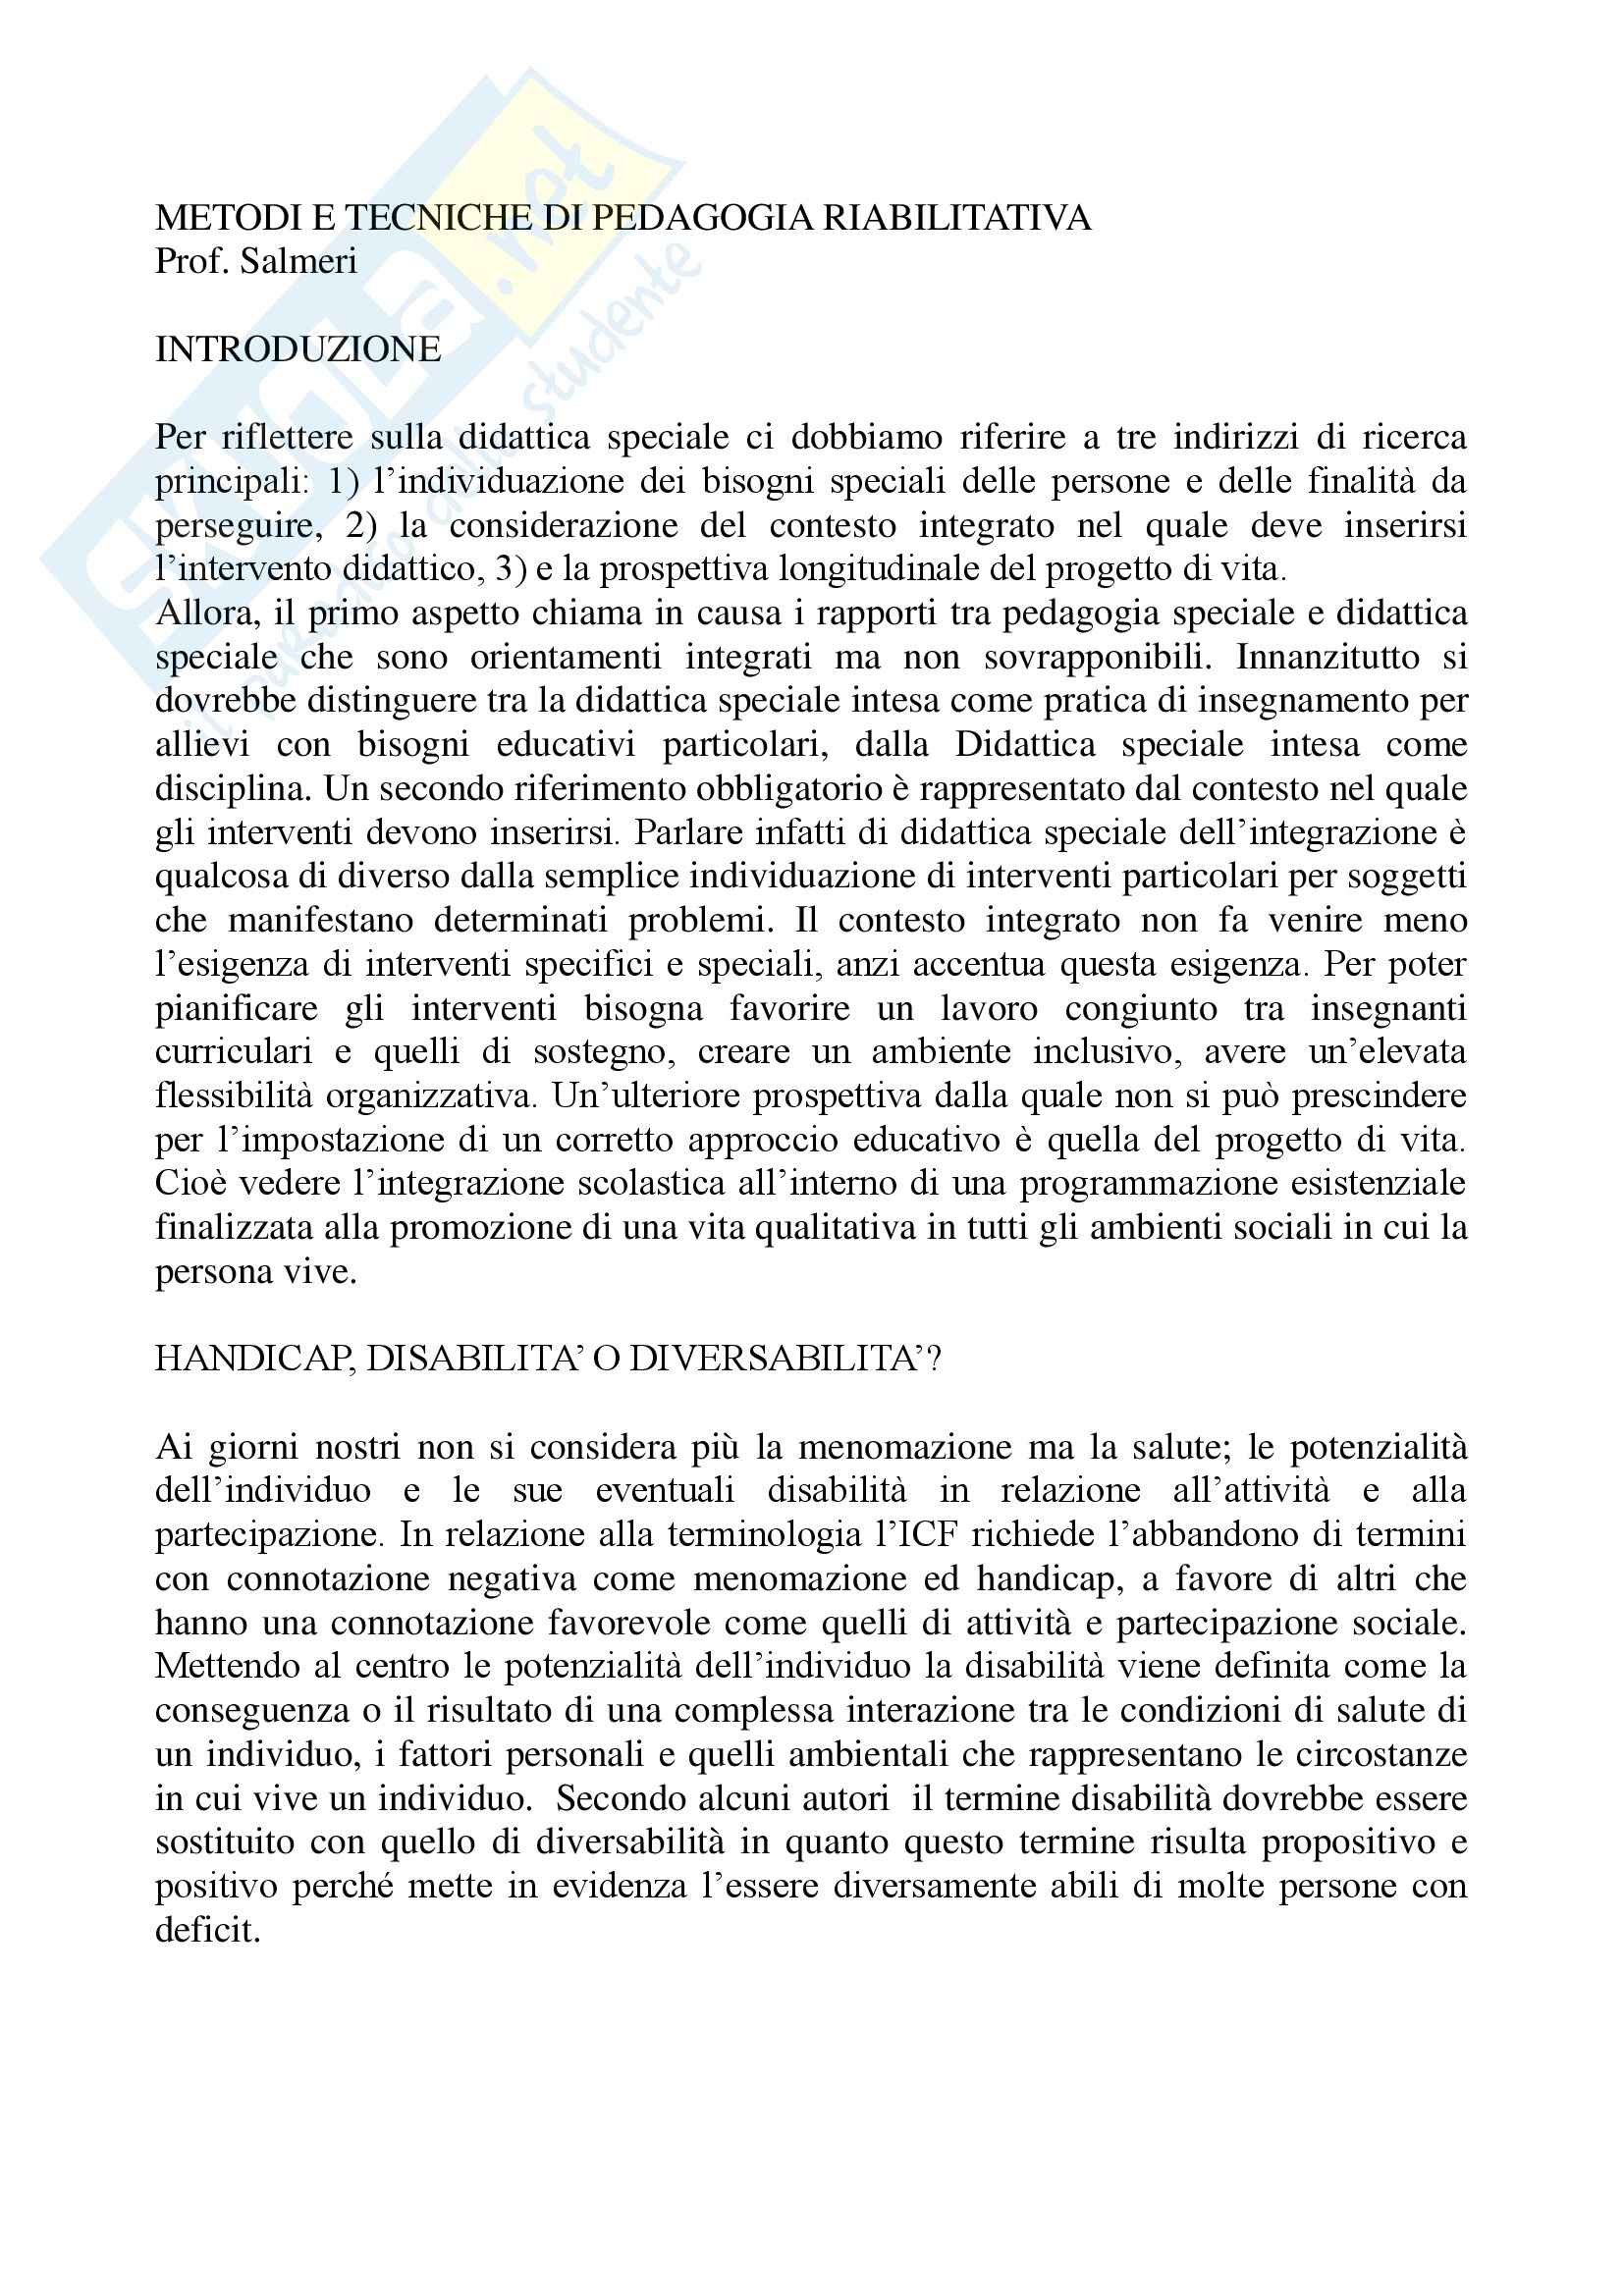 appunto S. Salmeri Pedagogia